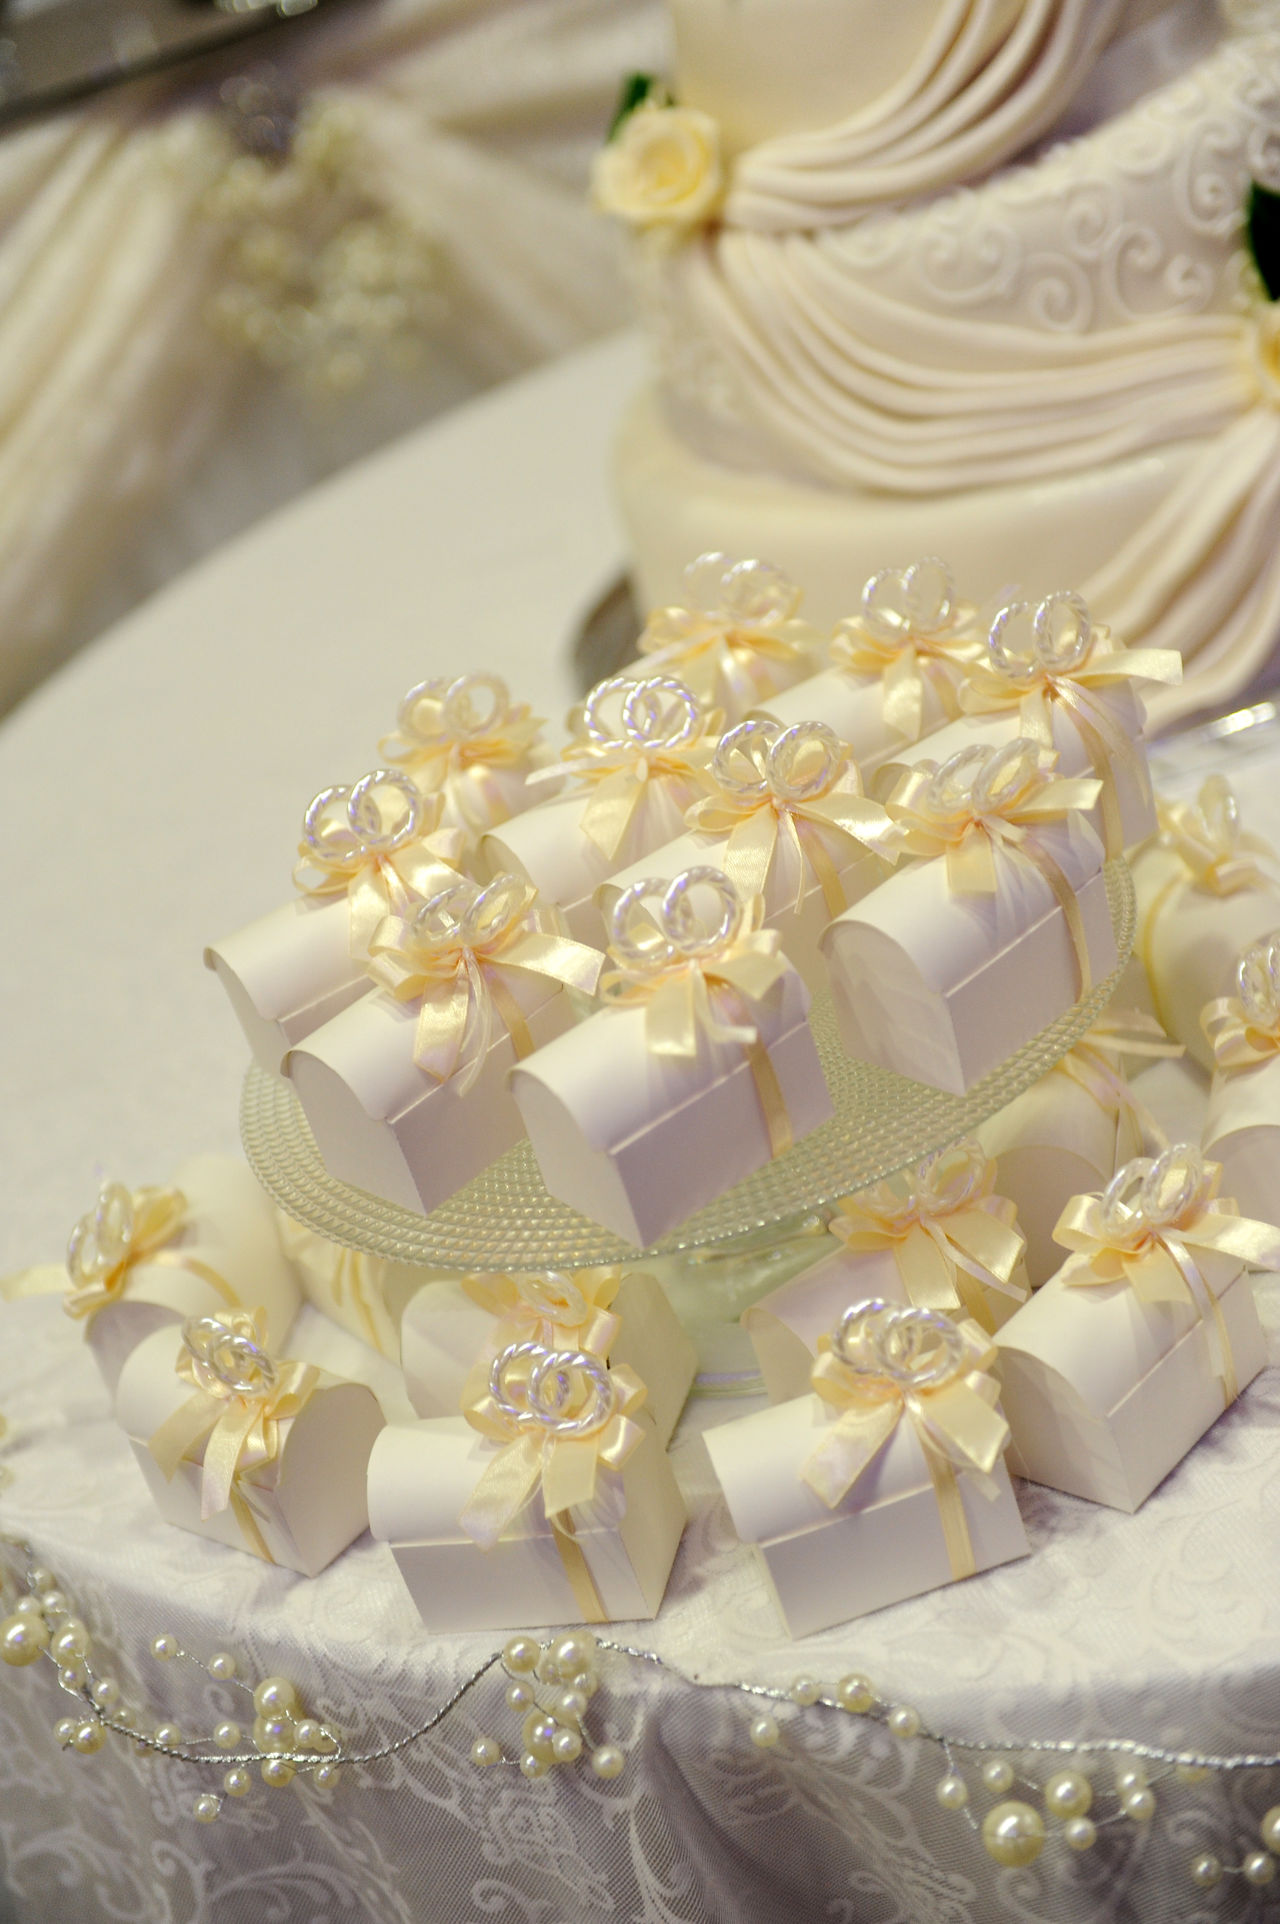 Bride Cake Celebration Flower Gift Gifts ❤ Groom Indoors  Love Wedding Wedding Cake White